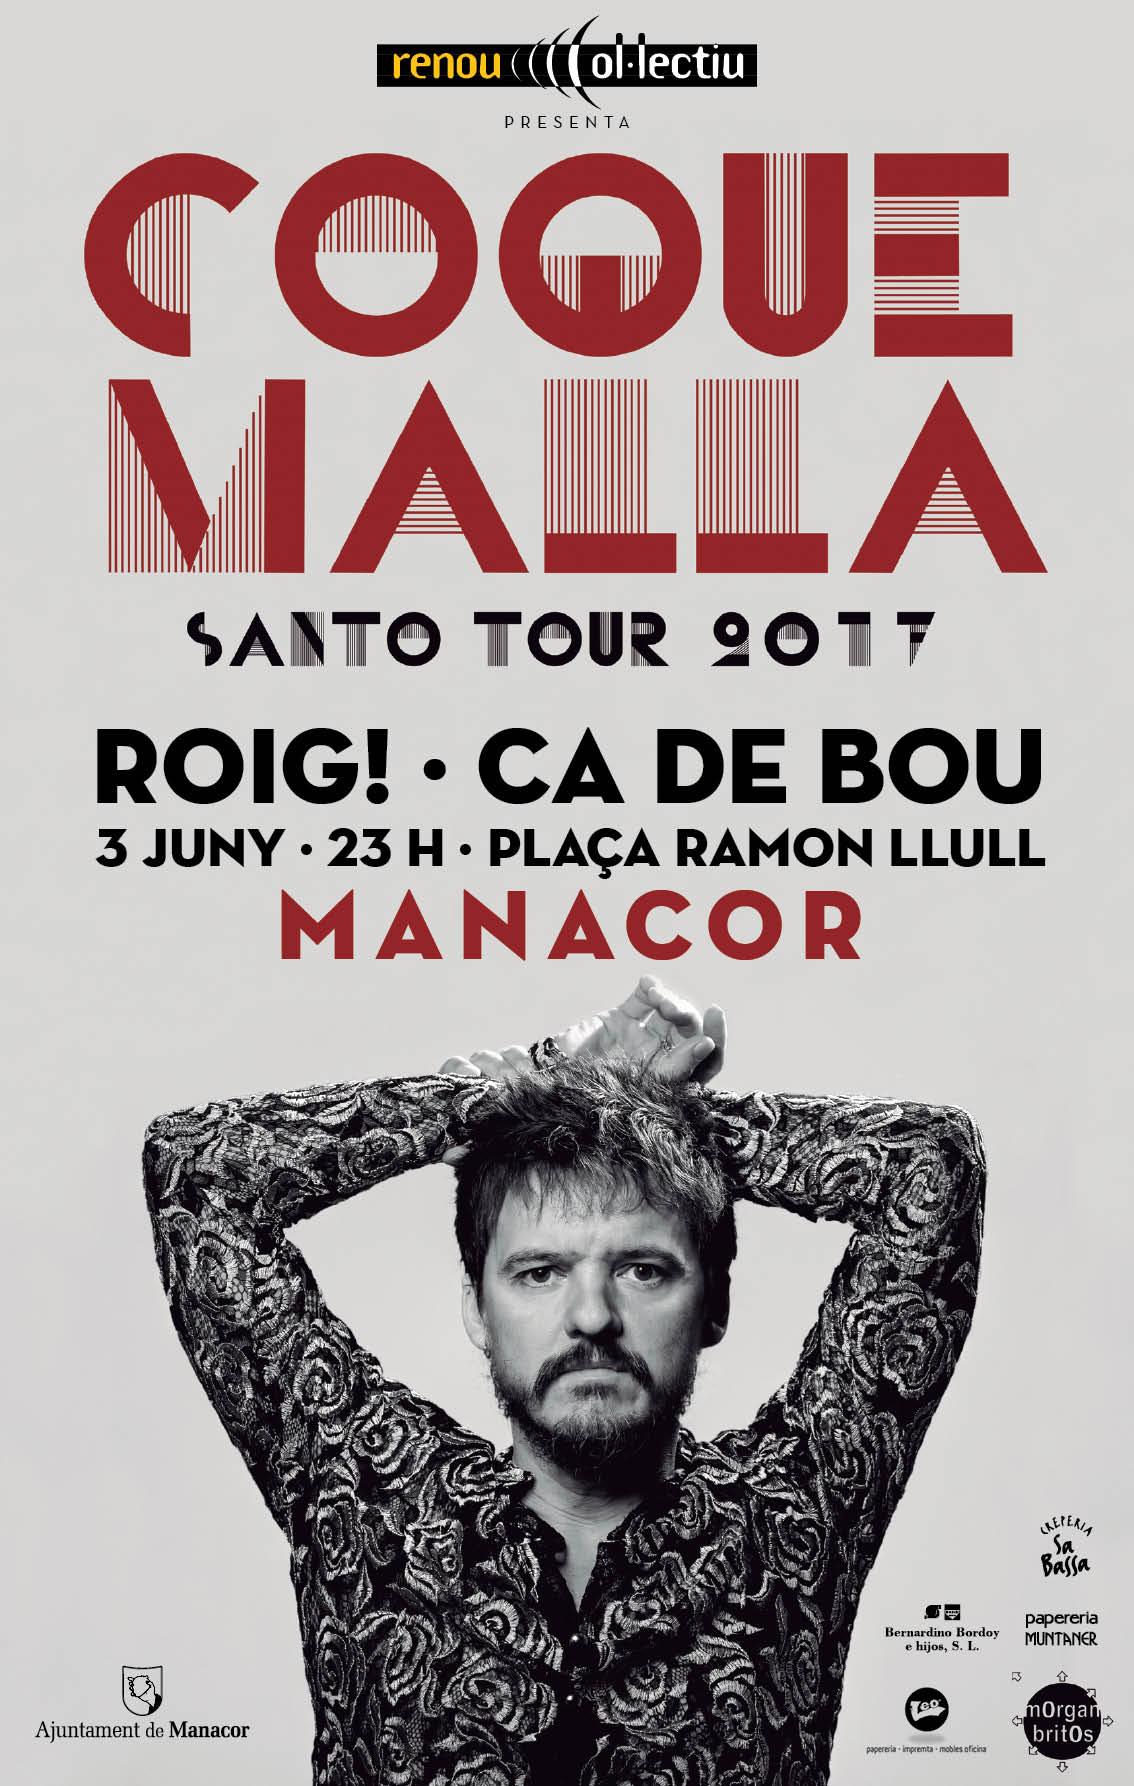 Cartell concert Coque Malla